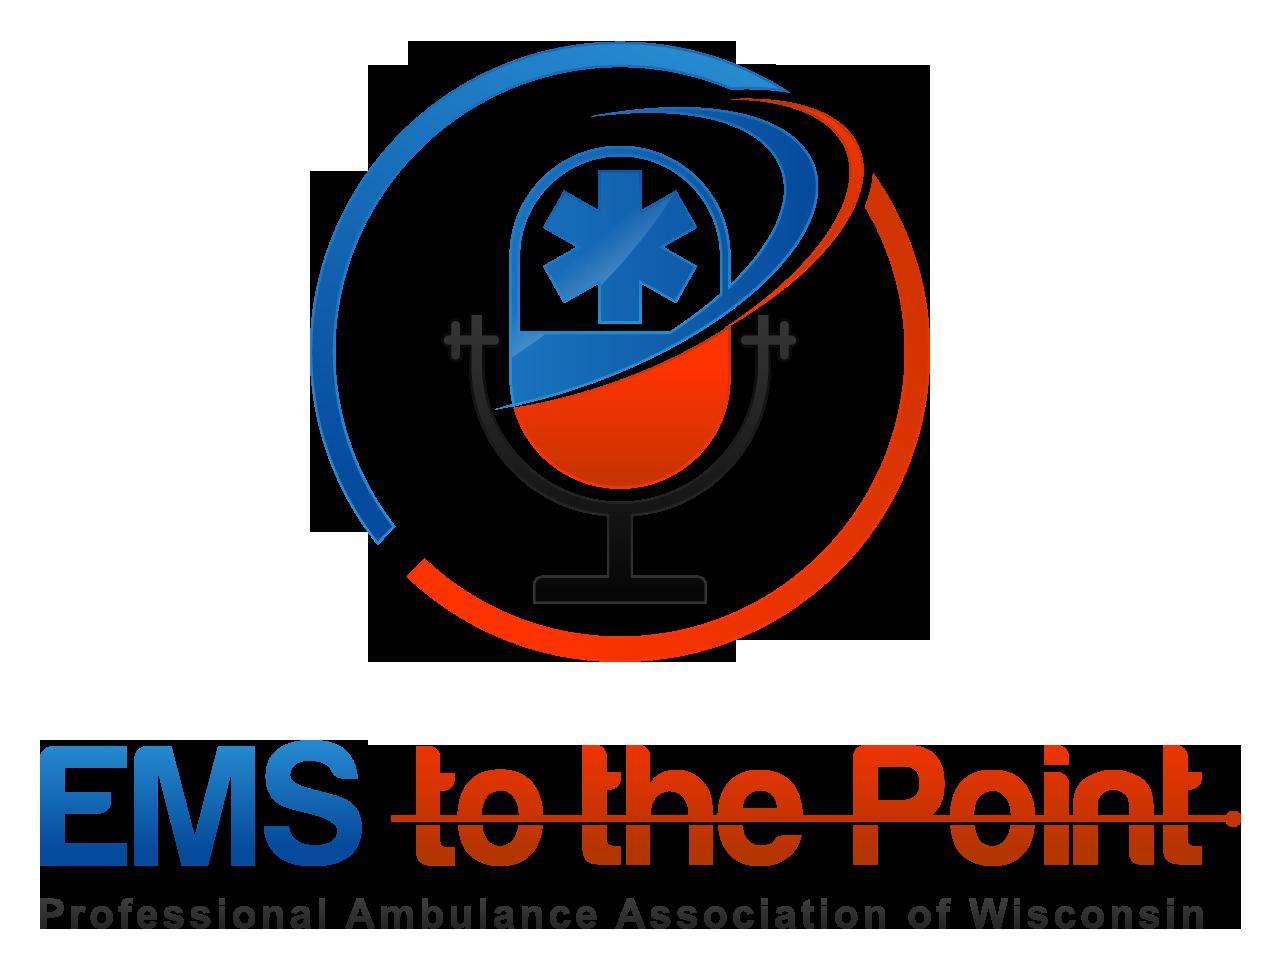 Medication/IV Kit | EMSWorld.com